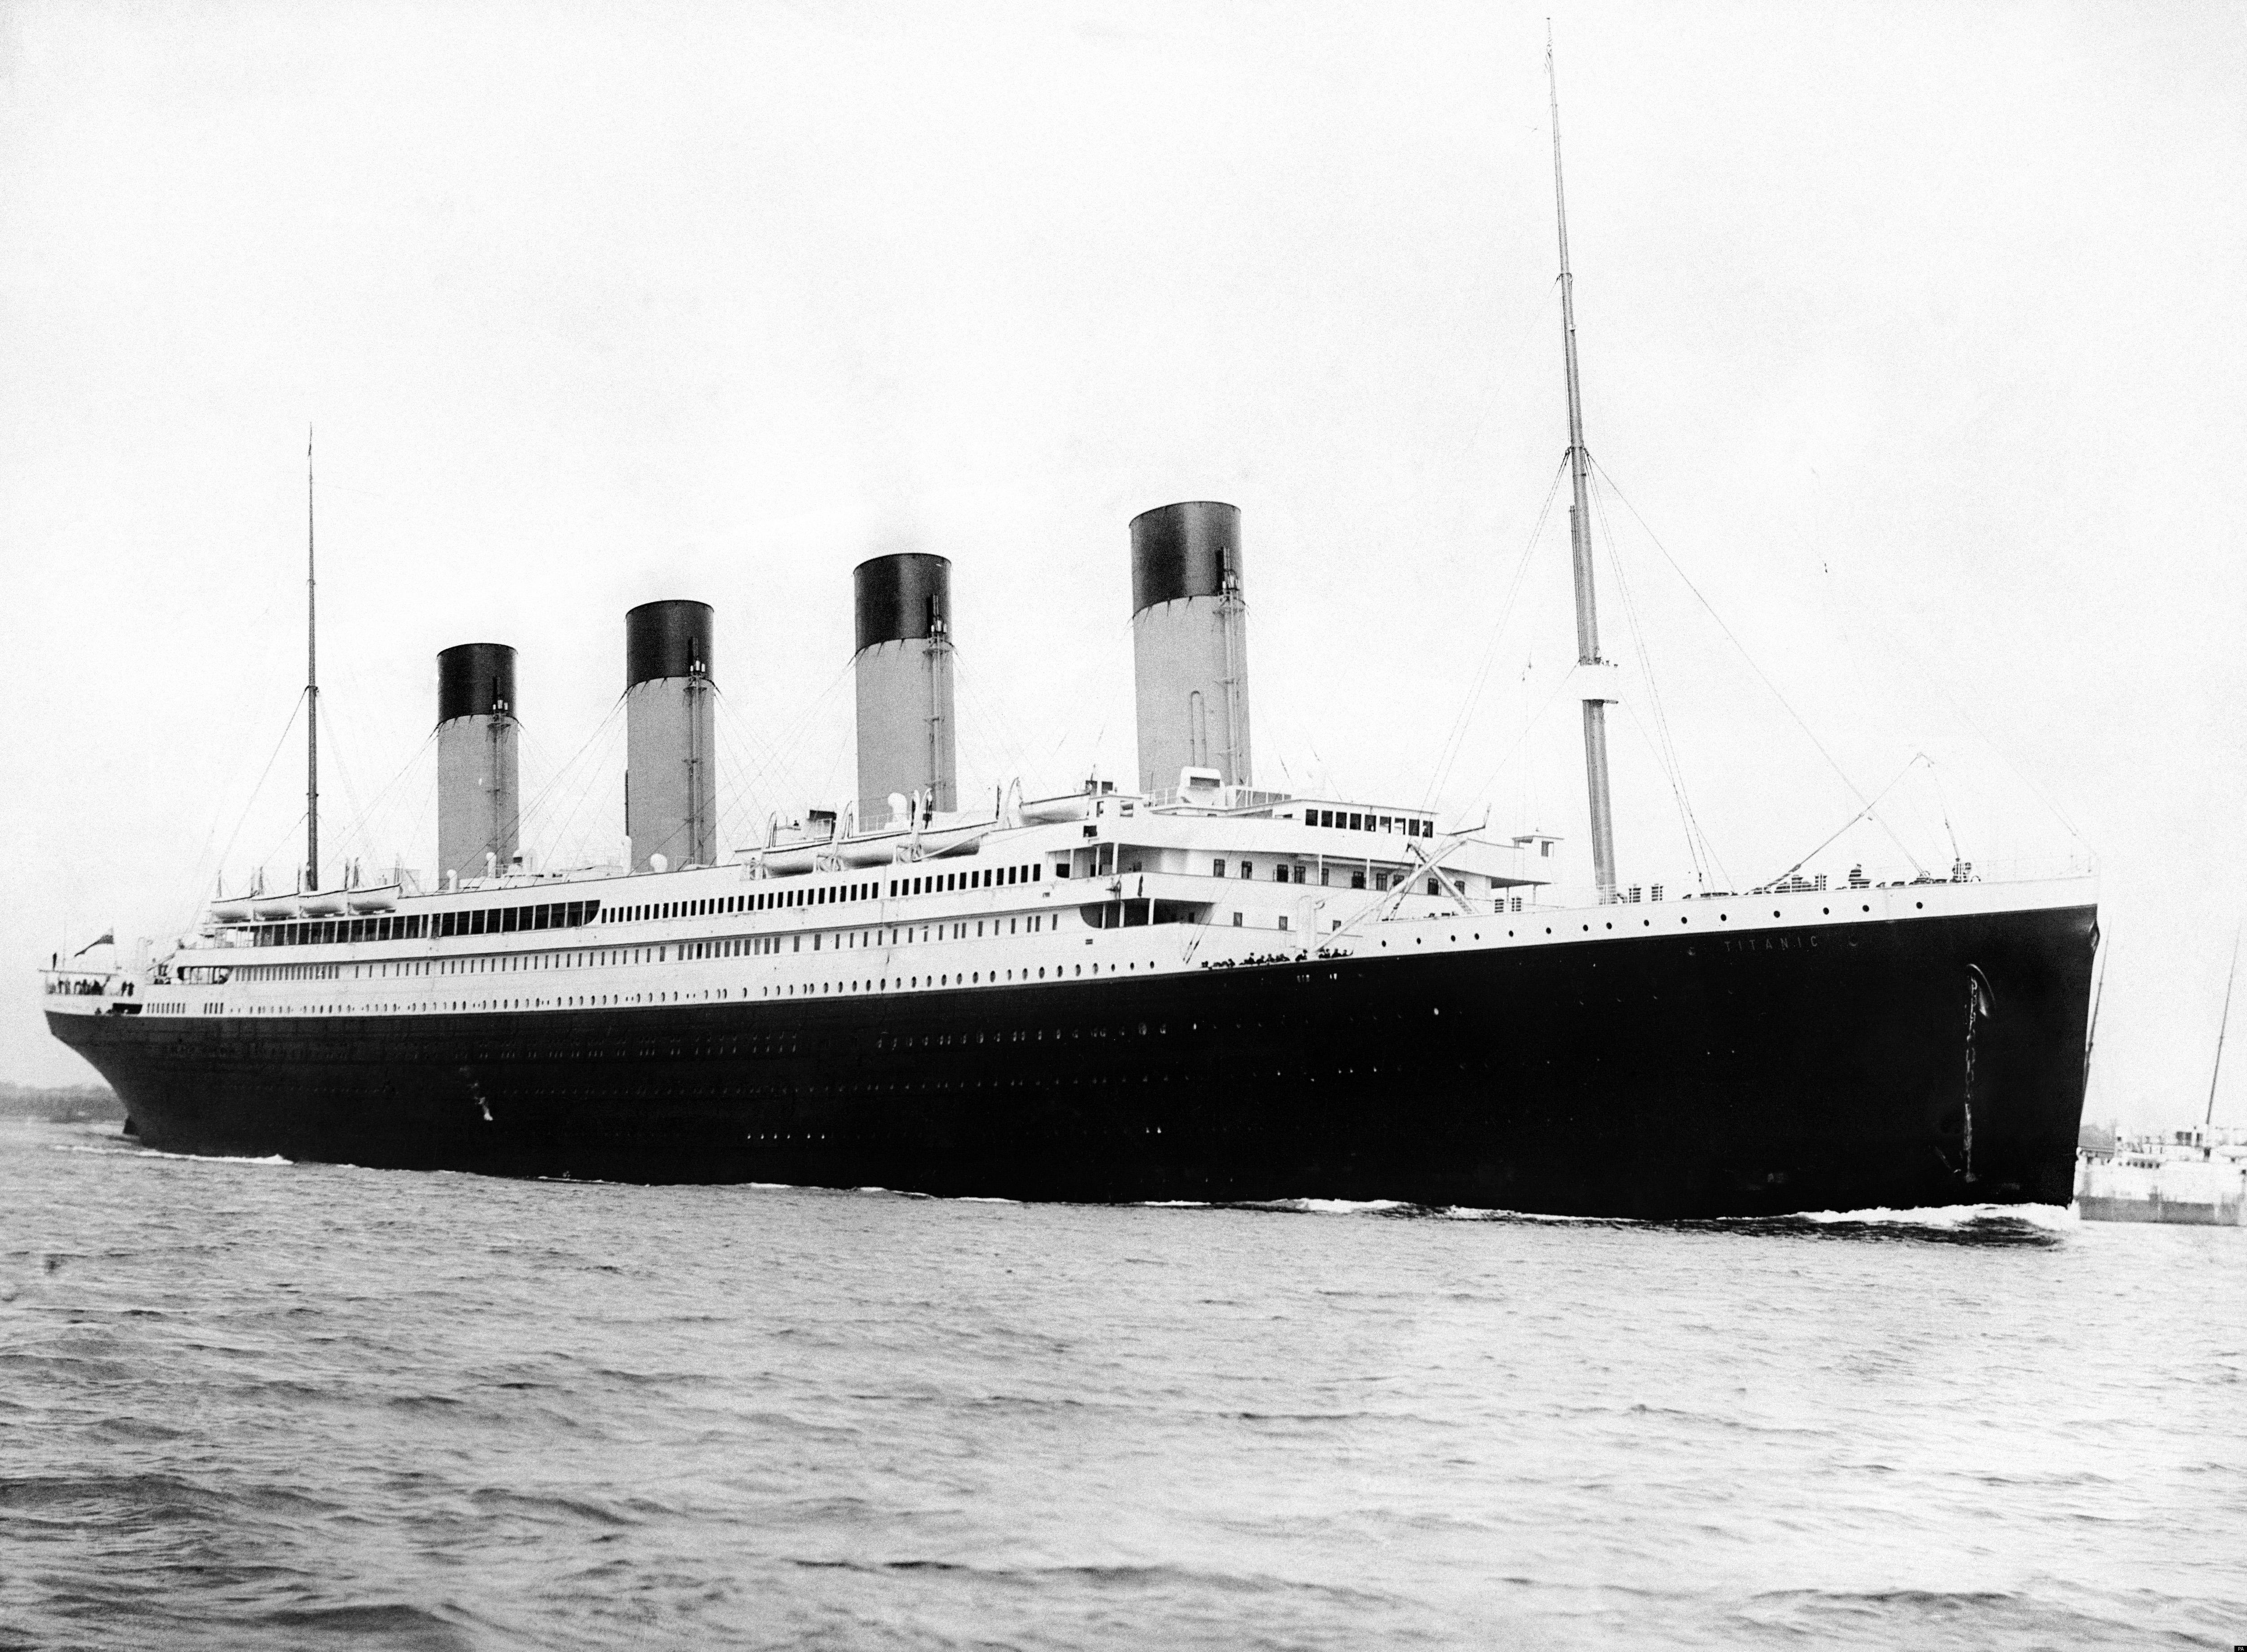 RMS Titanic departing Southampton